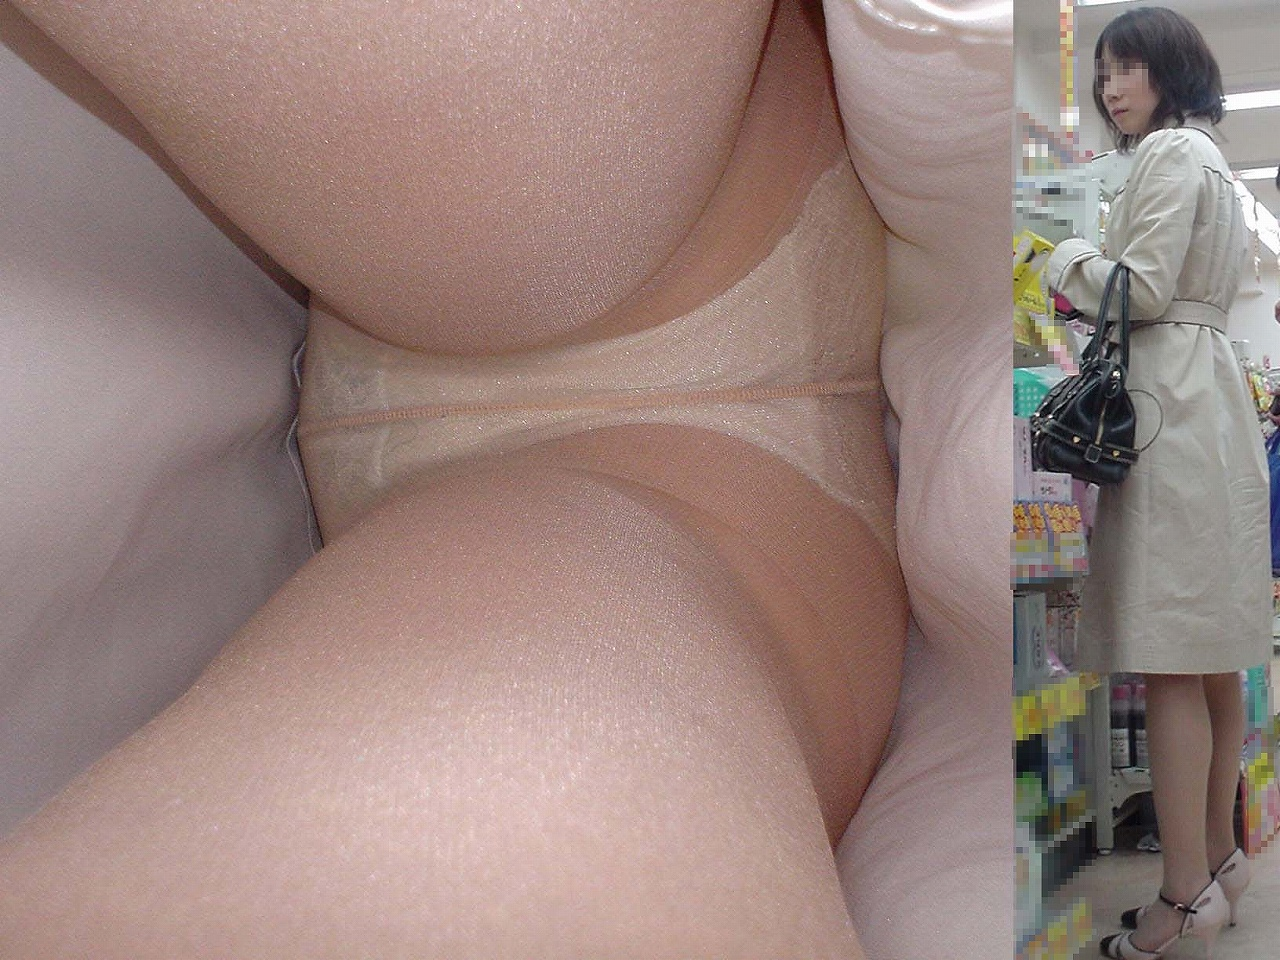 OLタイトスカートパンティ下着覗き願望エロ画像3枚目